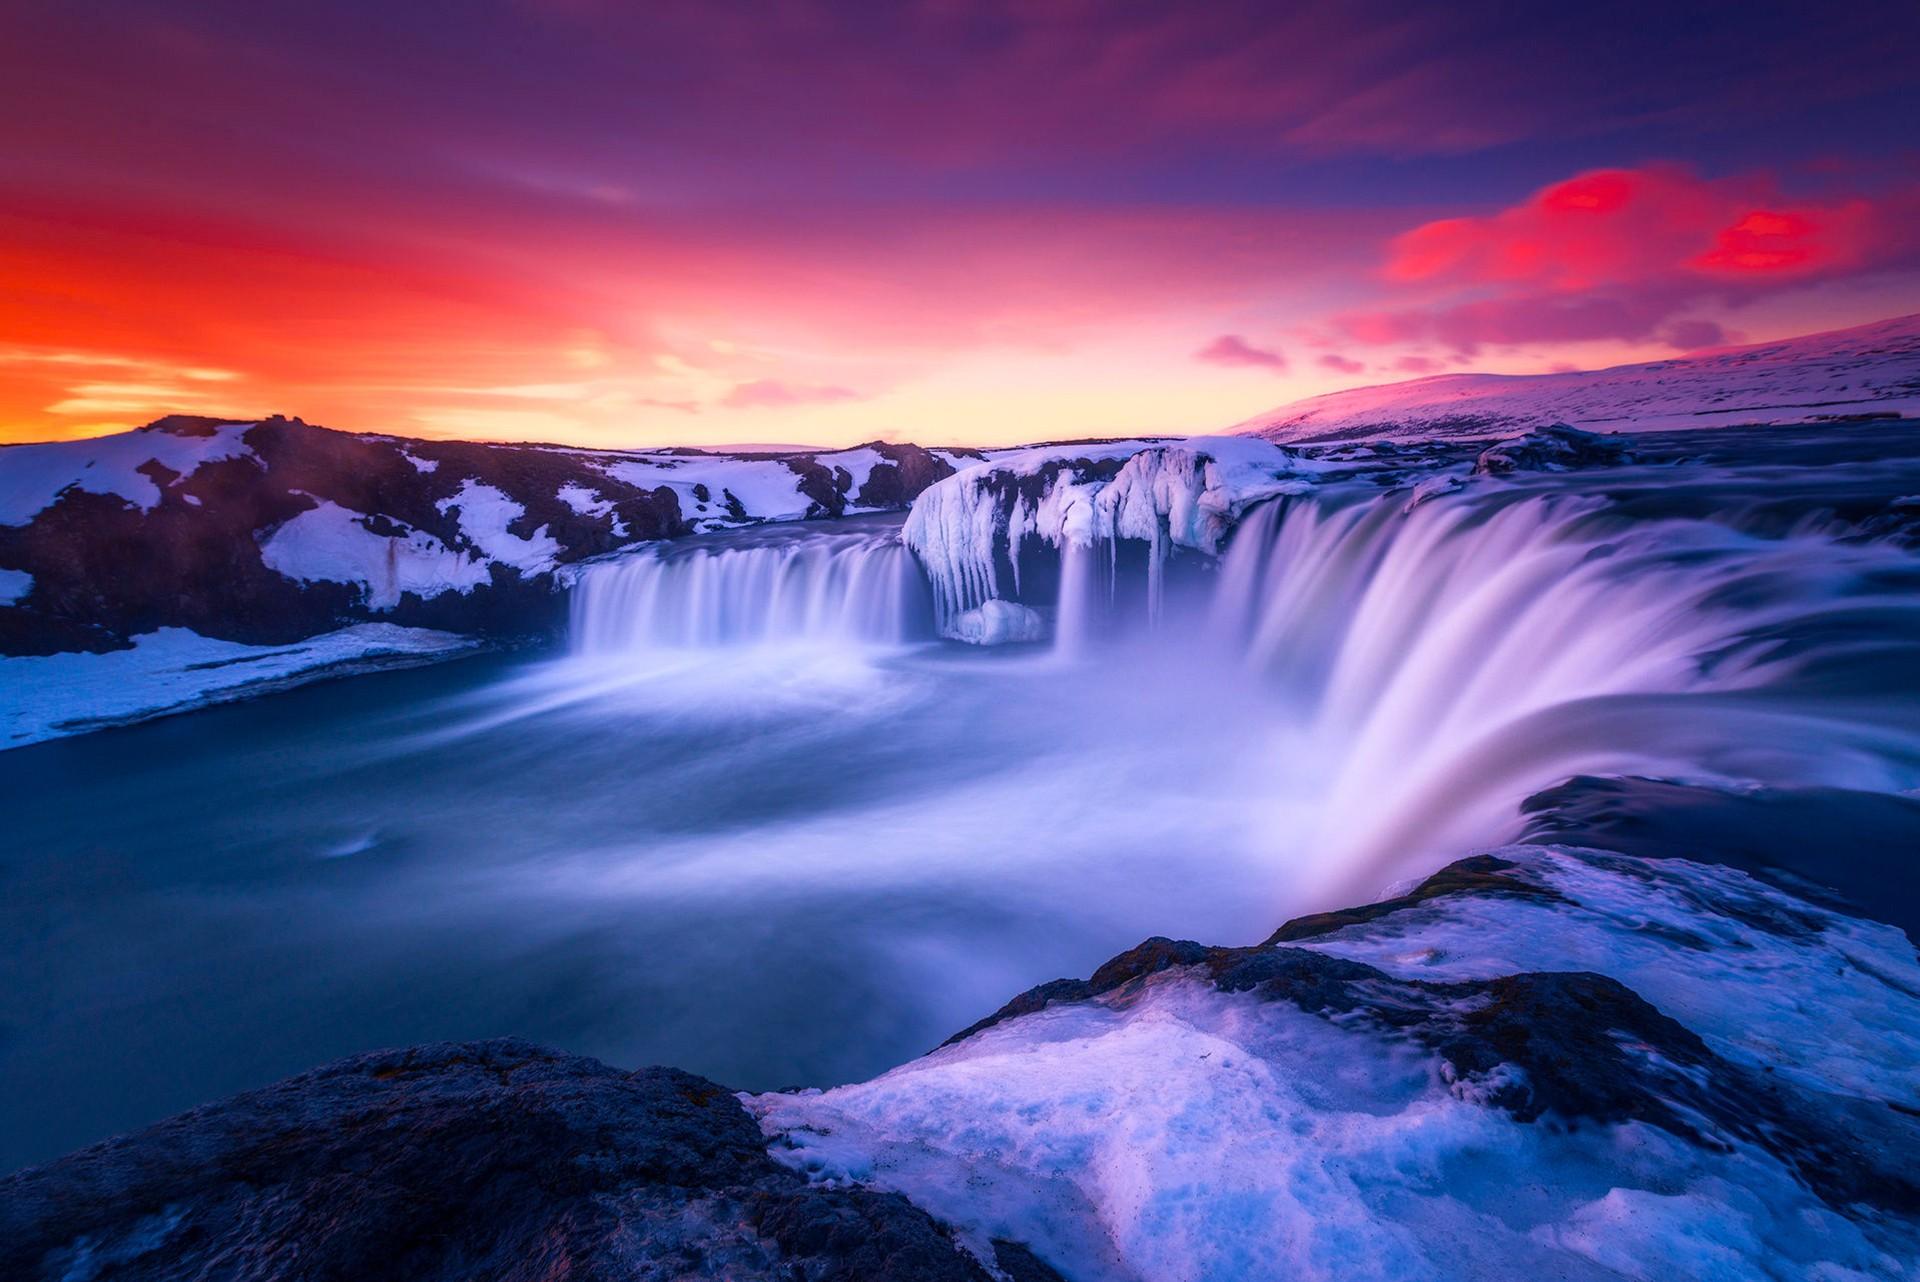 Niagara Water Falls Desktop Wallpaper Waterfall Iceland Hd Nature 4k Wallpapers Images